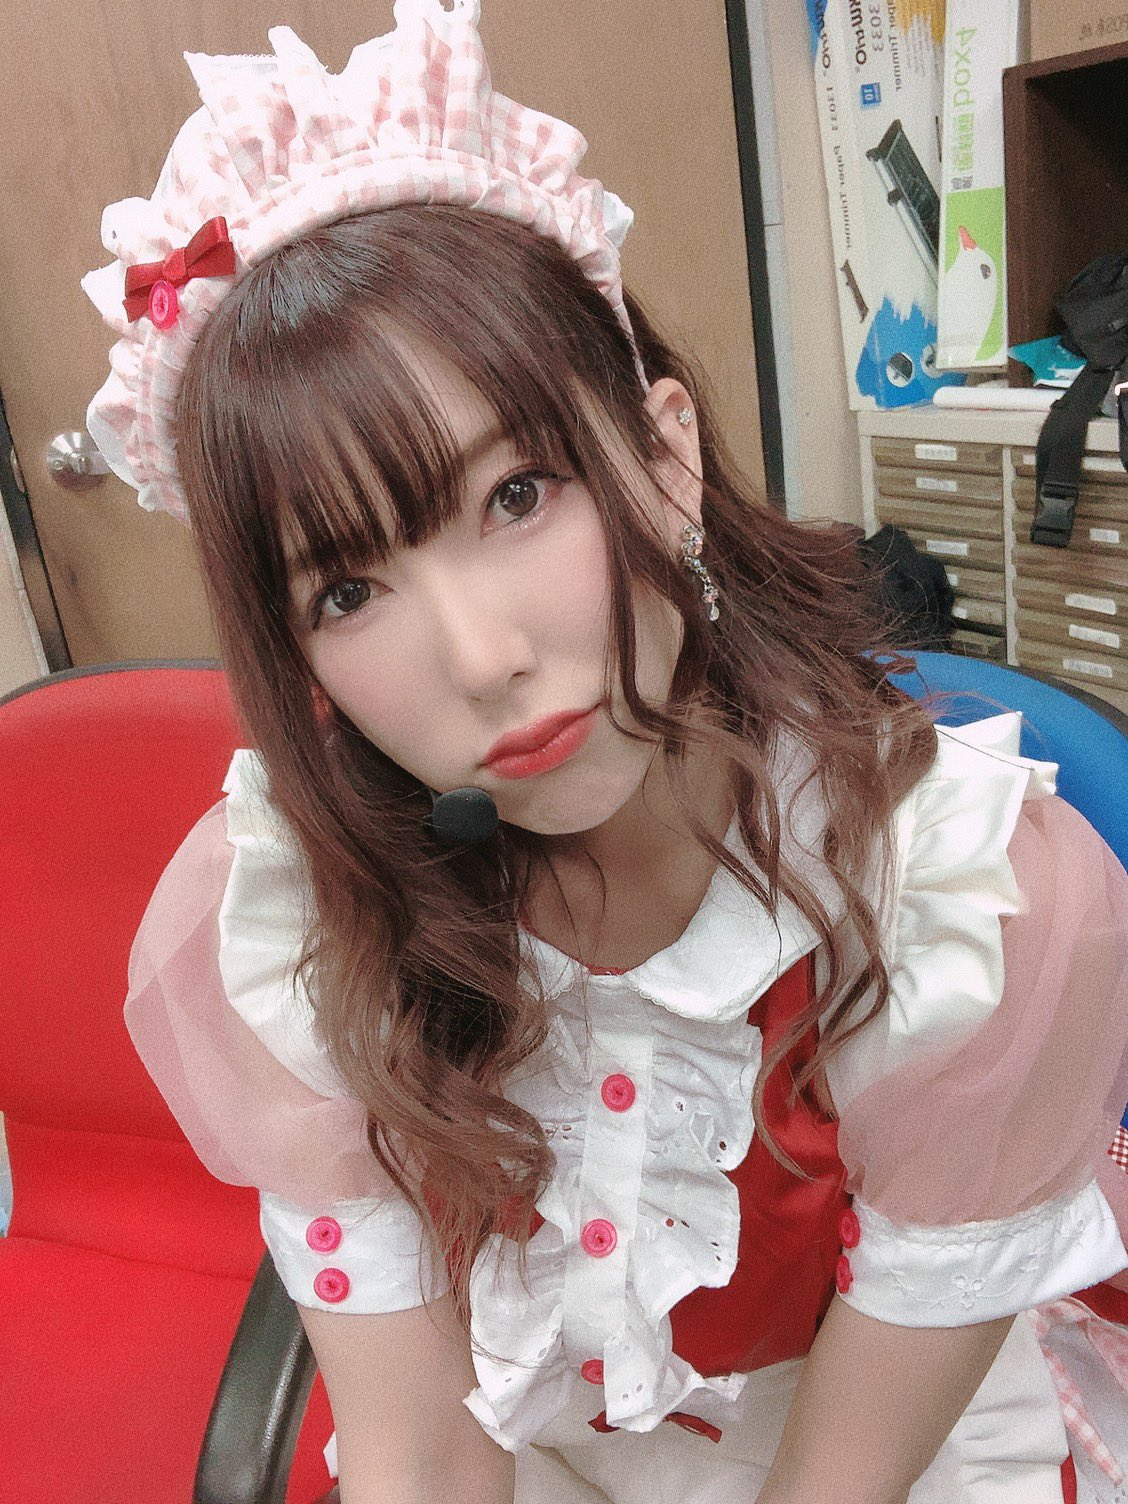 hatano_yui 1188022218313199616_p0